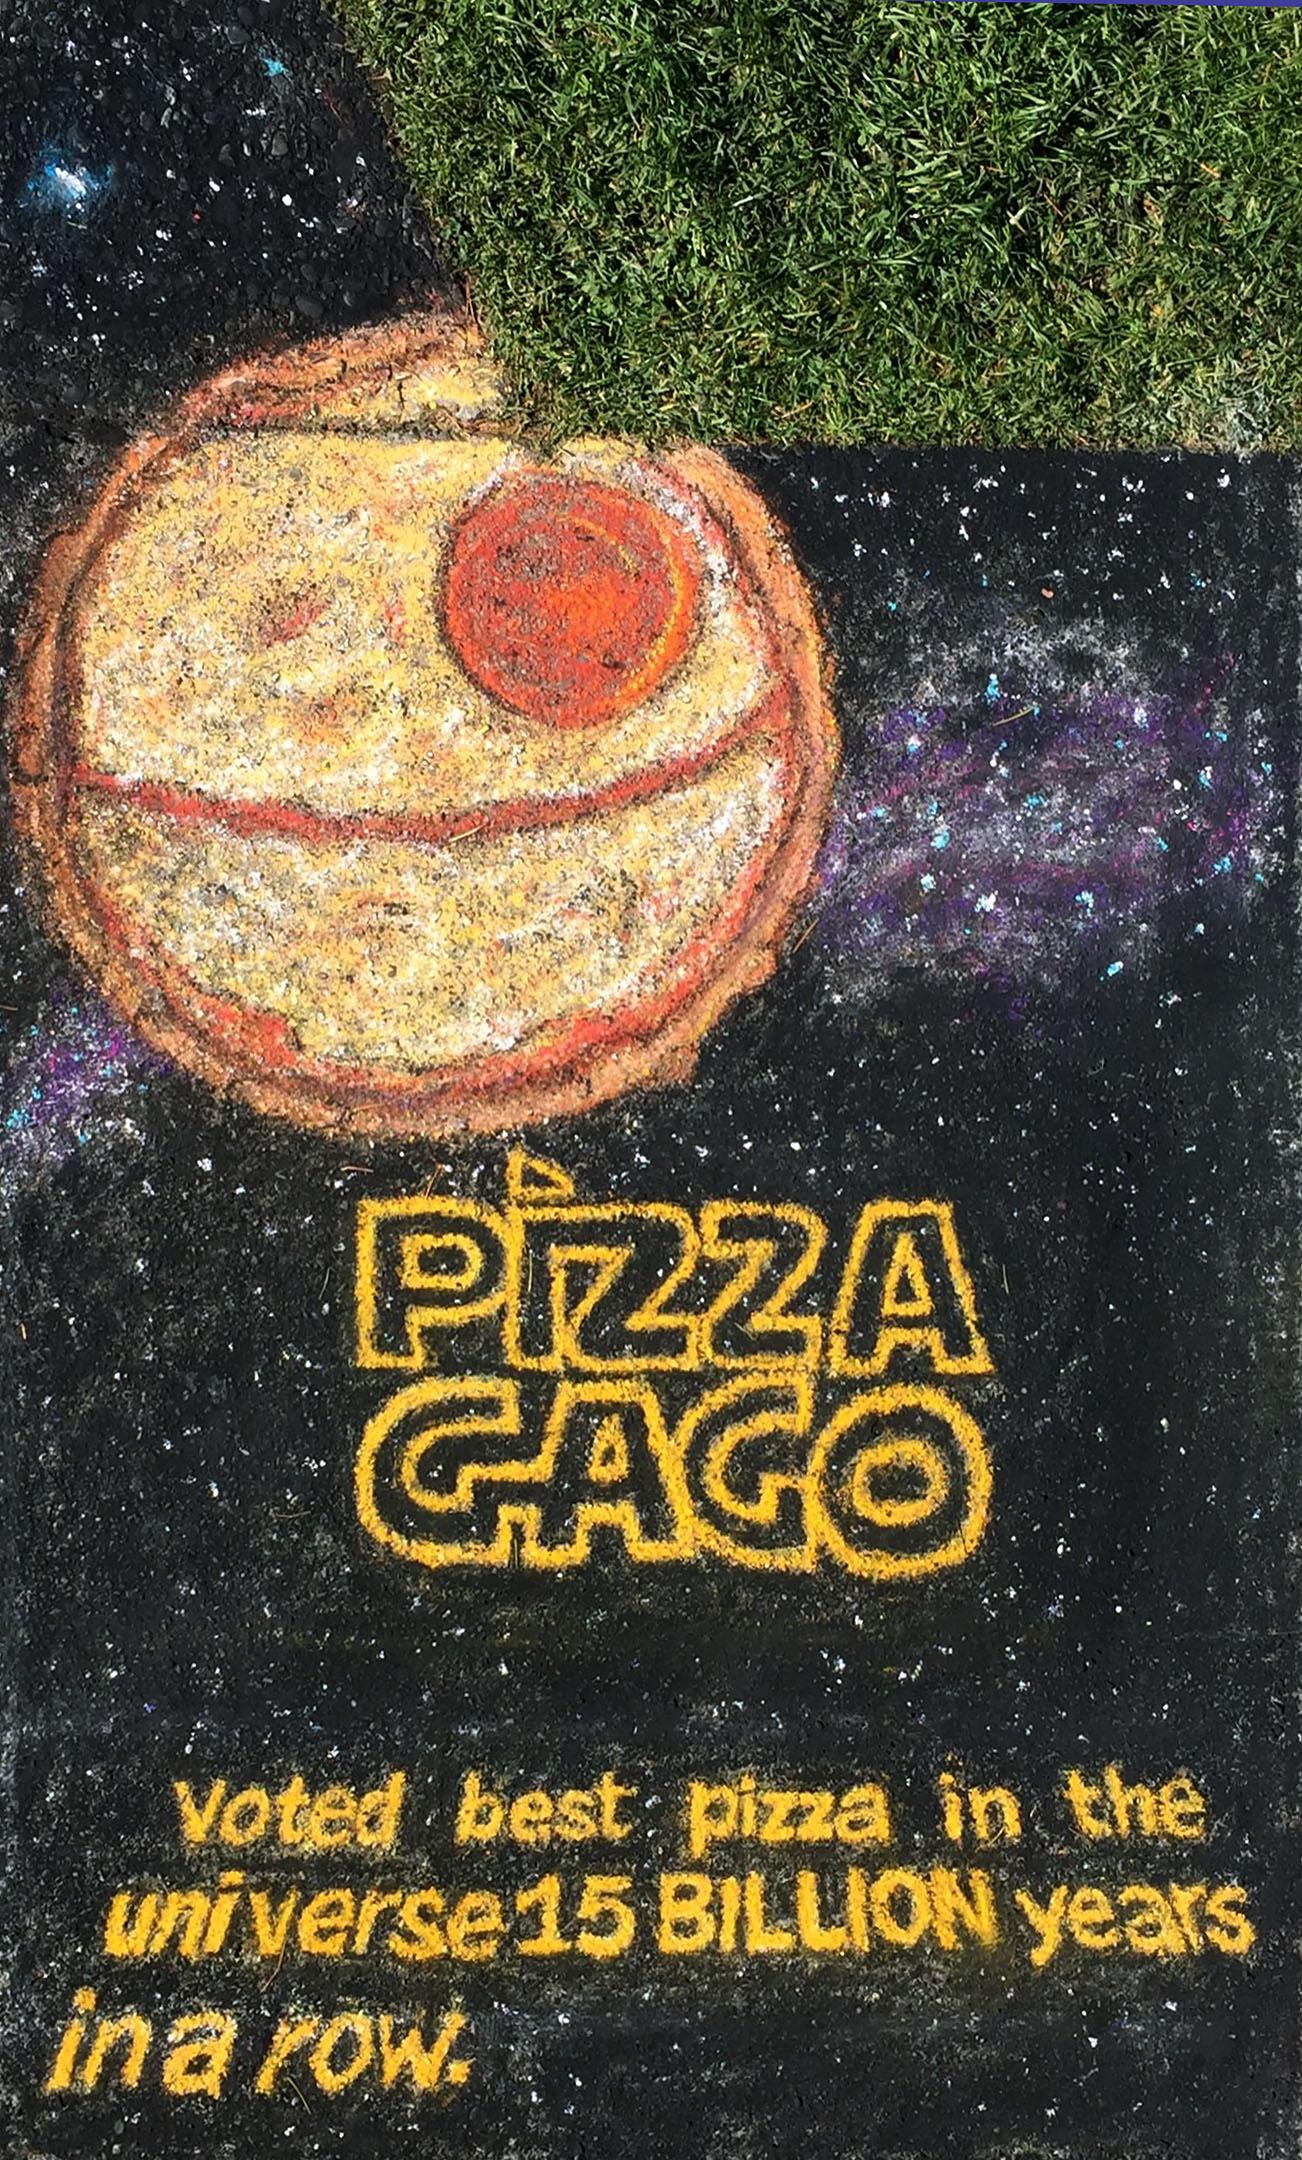 Pizza Gago plaza